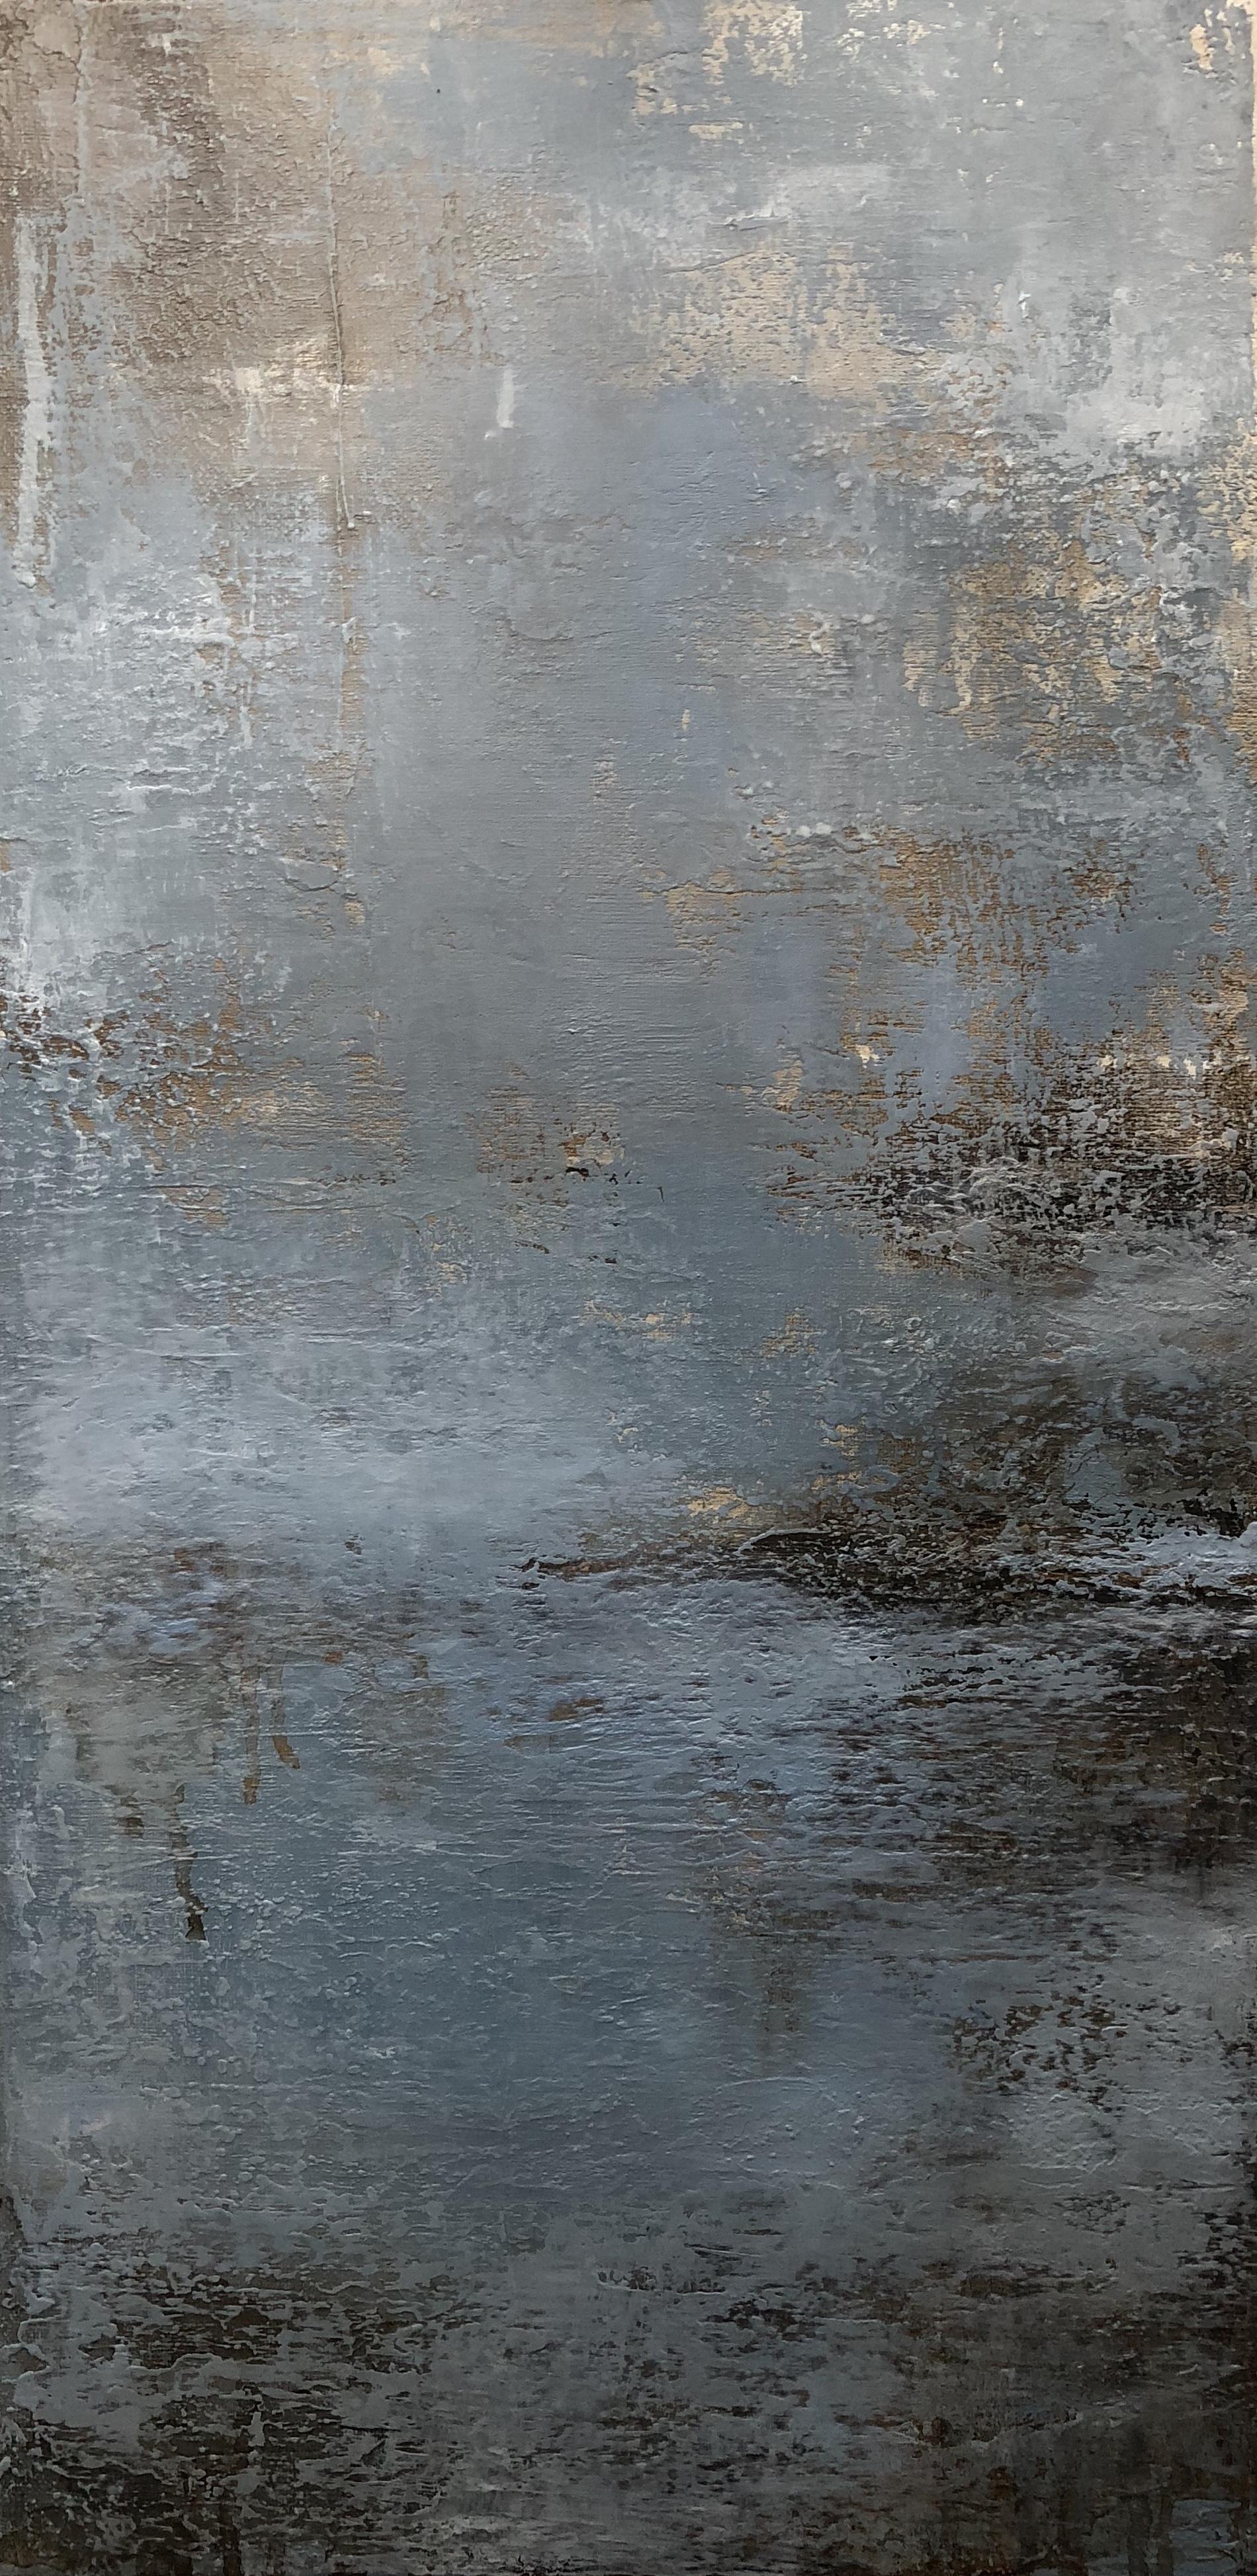 Margarita Andreevna Yakuncheva. Abstract landscape